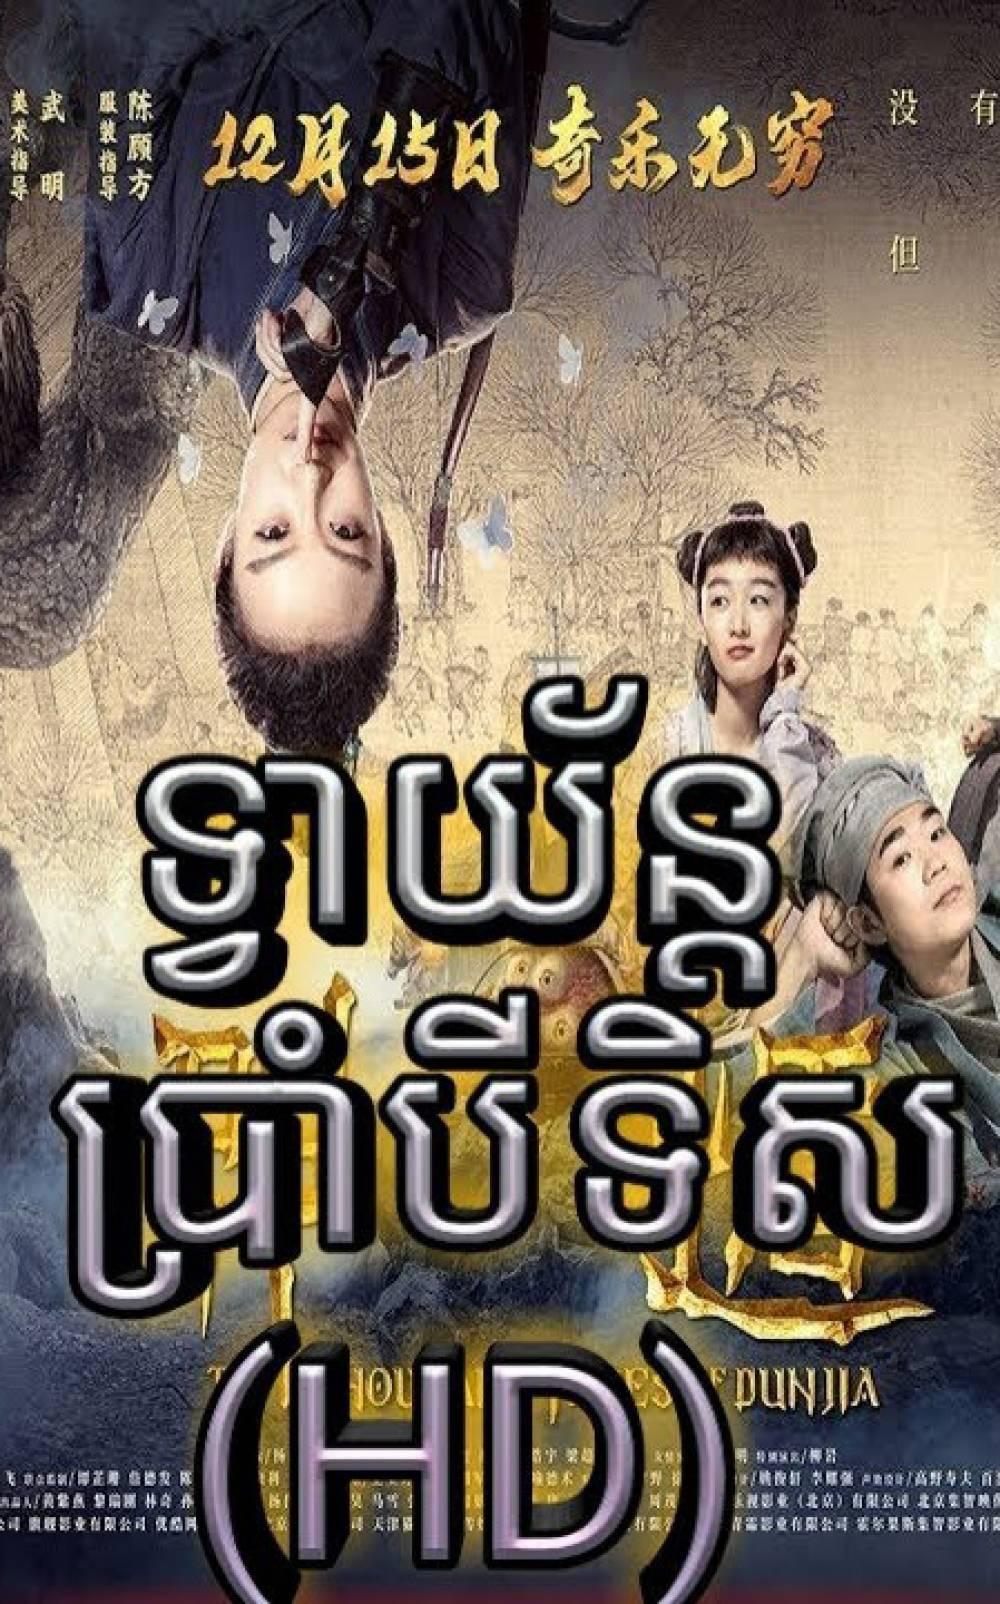 Chinese Movie Speak Khmer : chinese, movie, speak, khmer, S7Movie.com, ទ្វាយ័ន្ត៨ទិស, (Full, China, Movie, (Speak, Khmer)